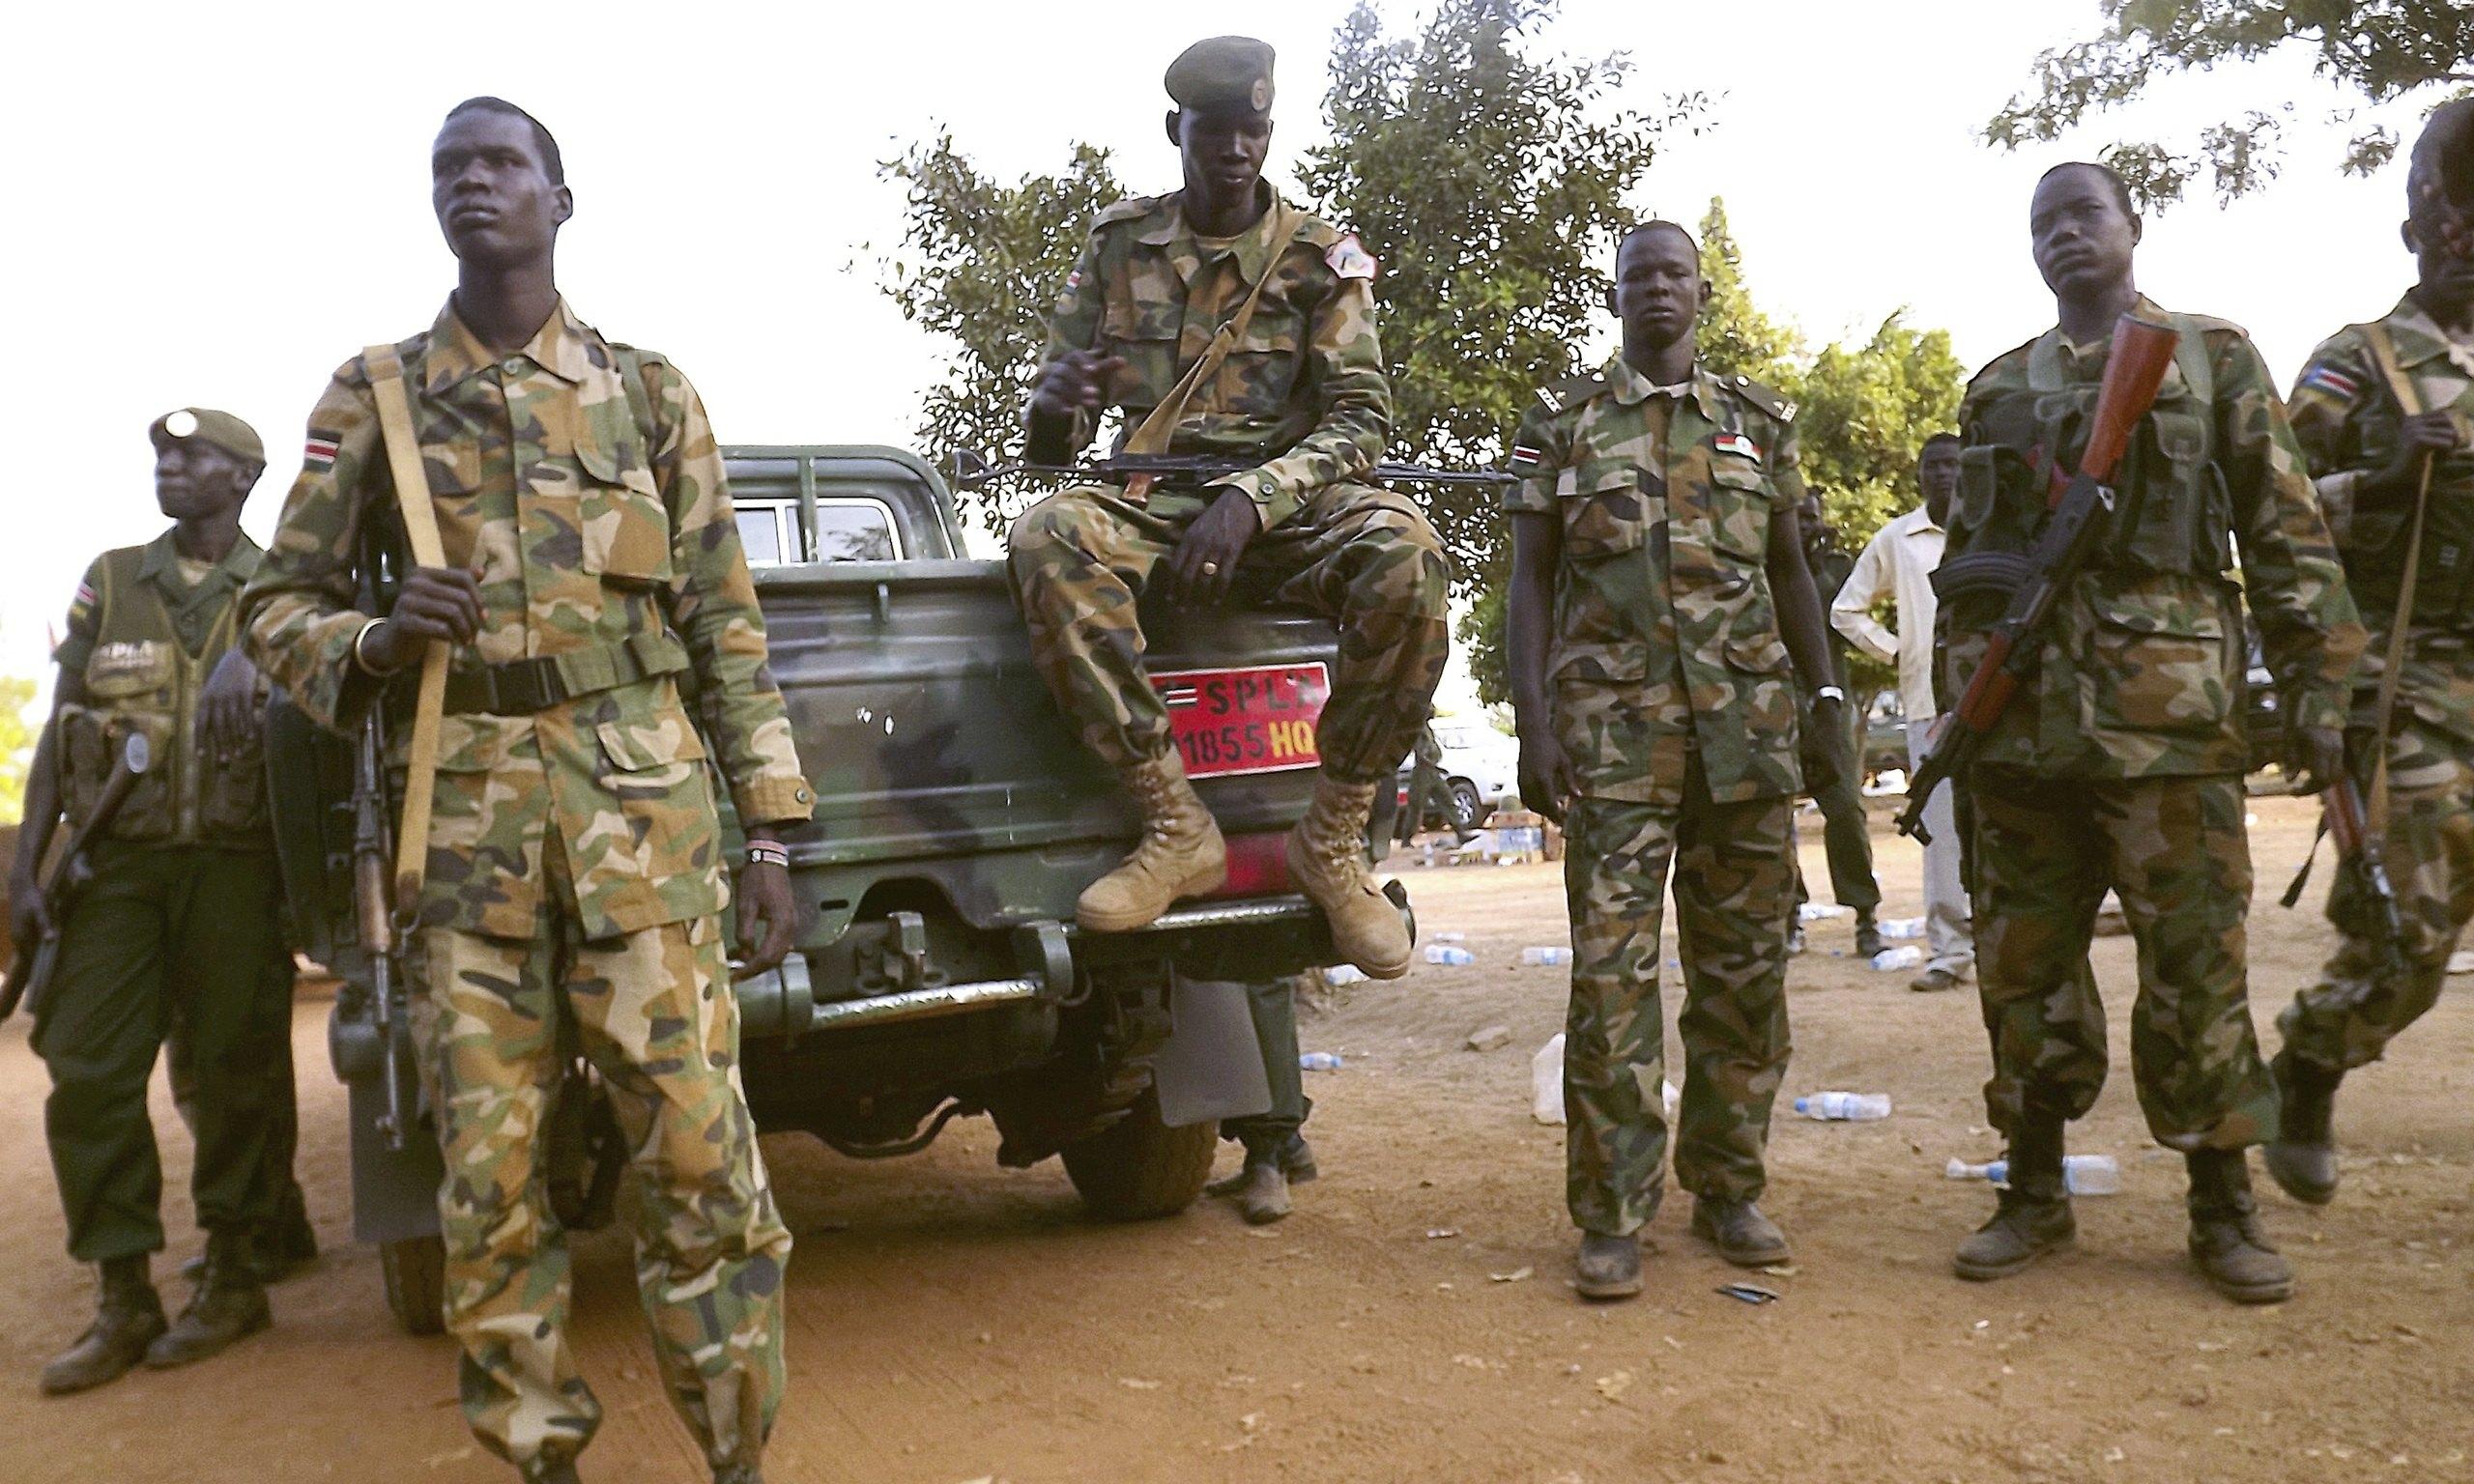 south sudan rebels forcibly recruiting civilians amid